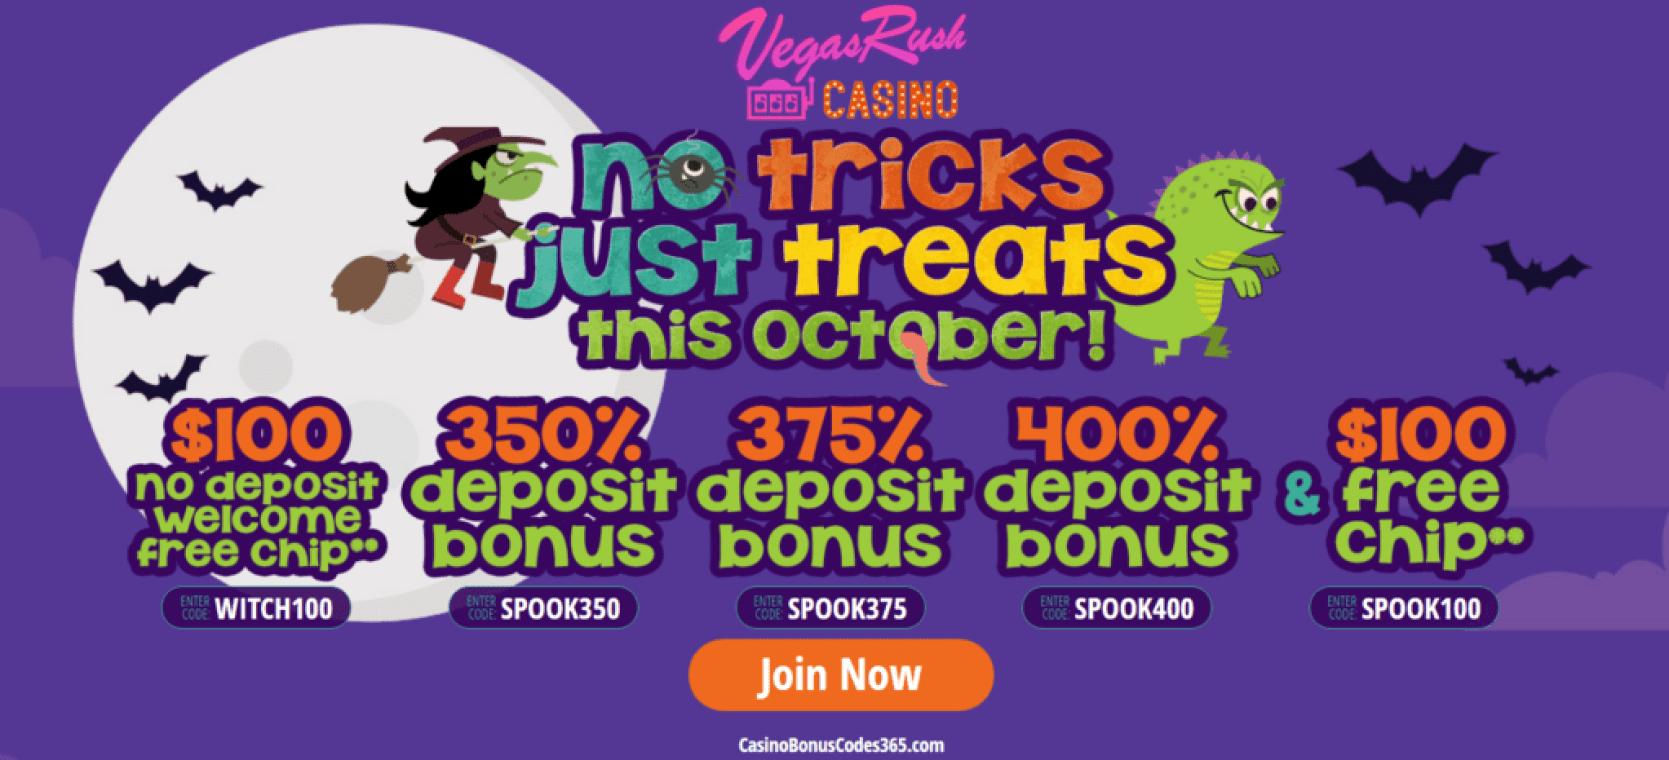 No deposit bonus $100